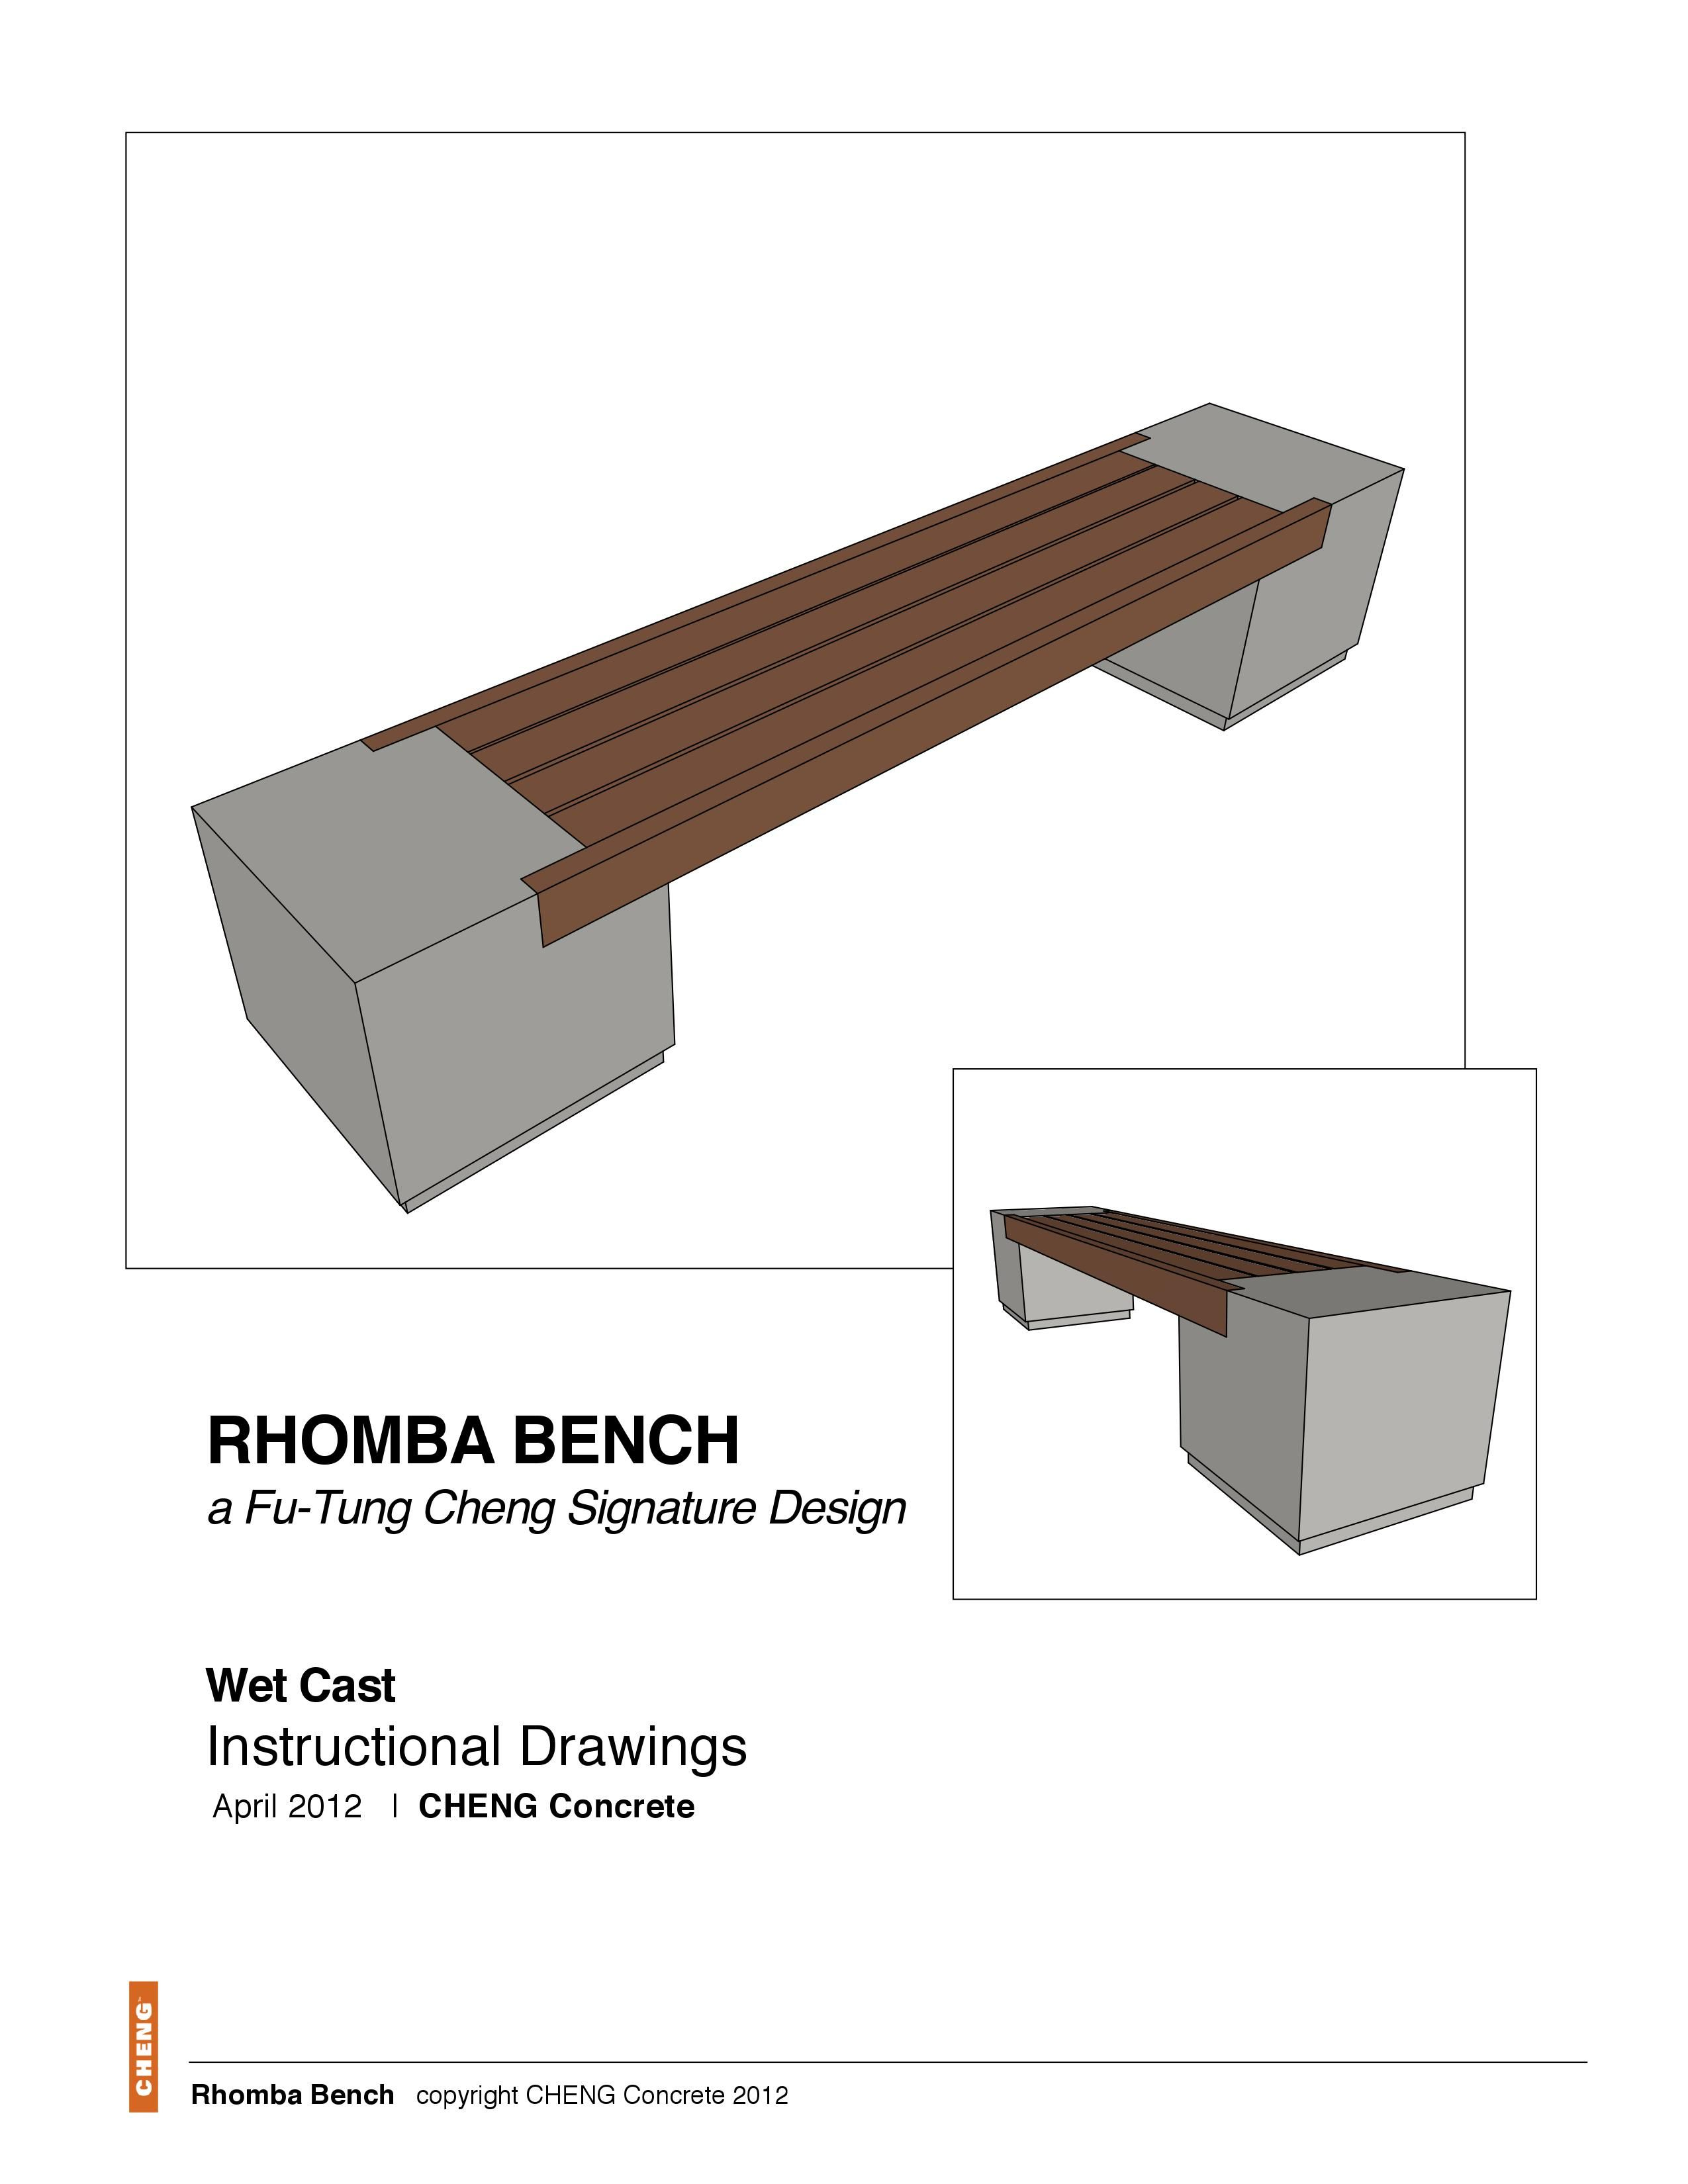 Cheng Concrete Exchange Drawings Rhomba Bench Wetcast Method